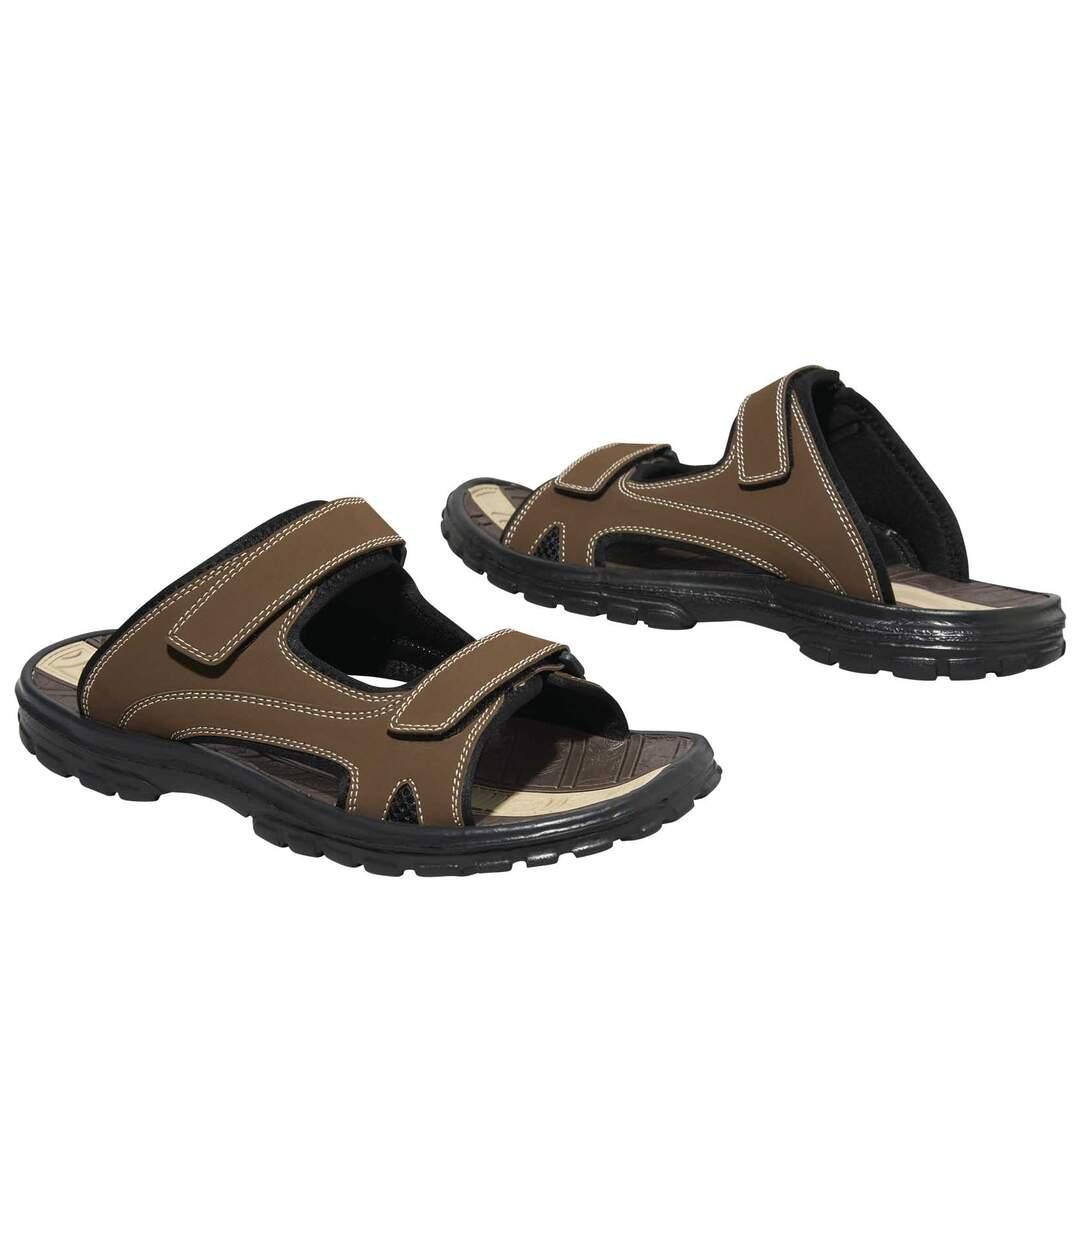 Men's Brown Summer Sandals Atlas For Men